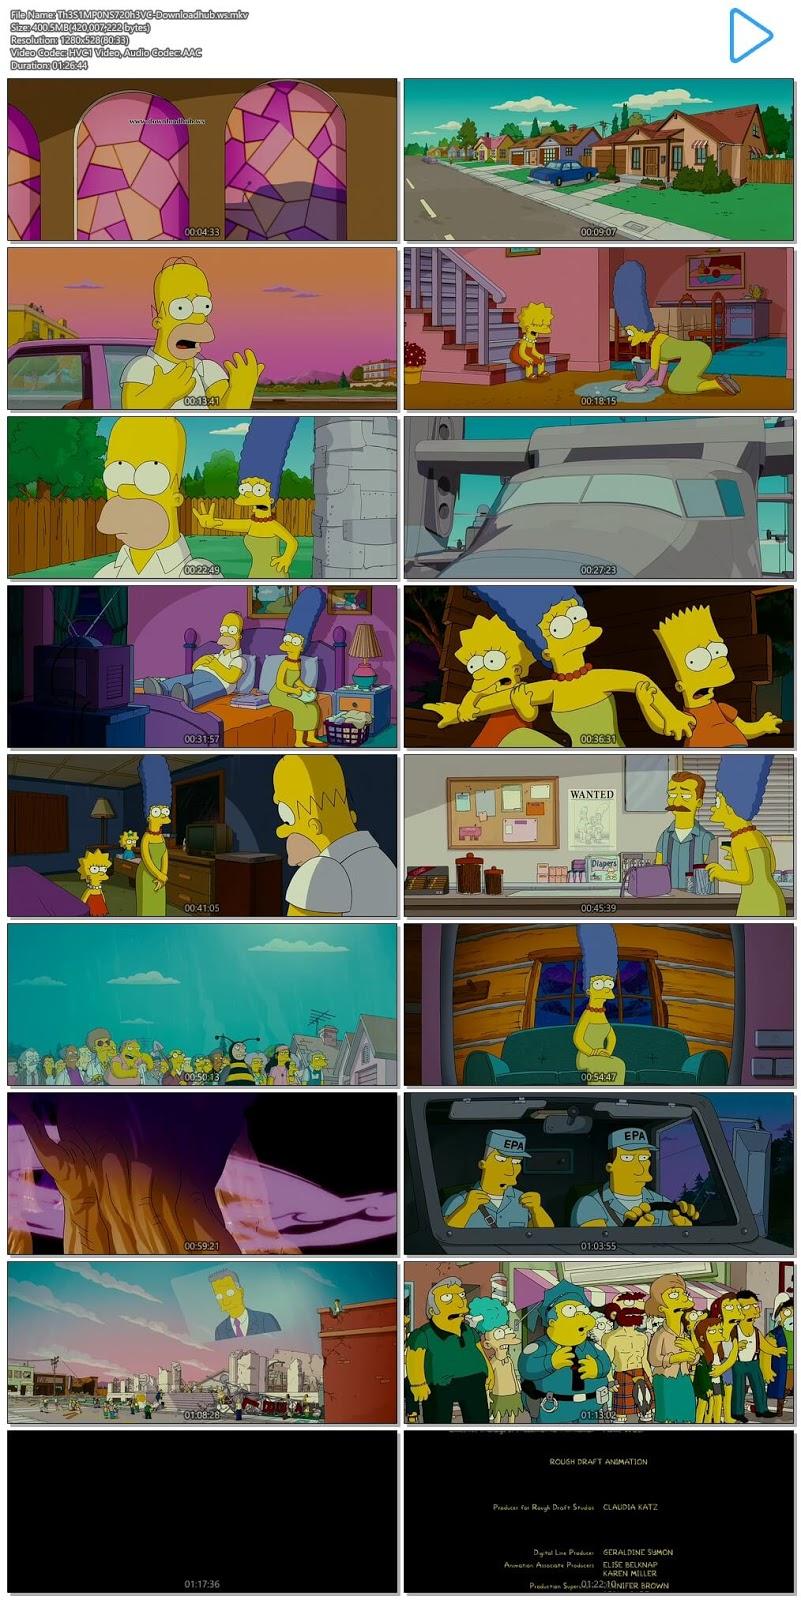 The Simpsons Movie 2007 English 720p HEVC BRRip ESubs